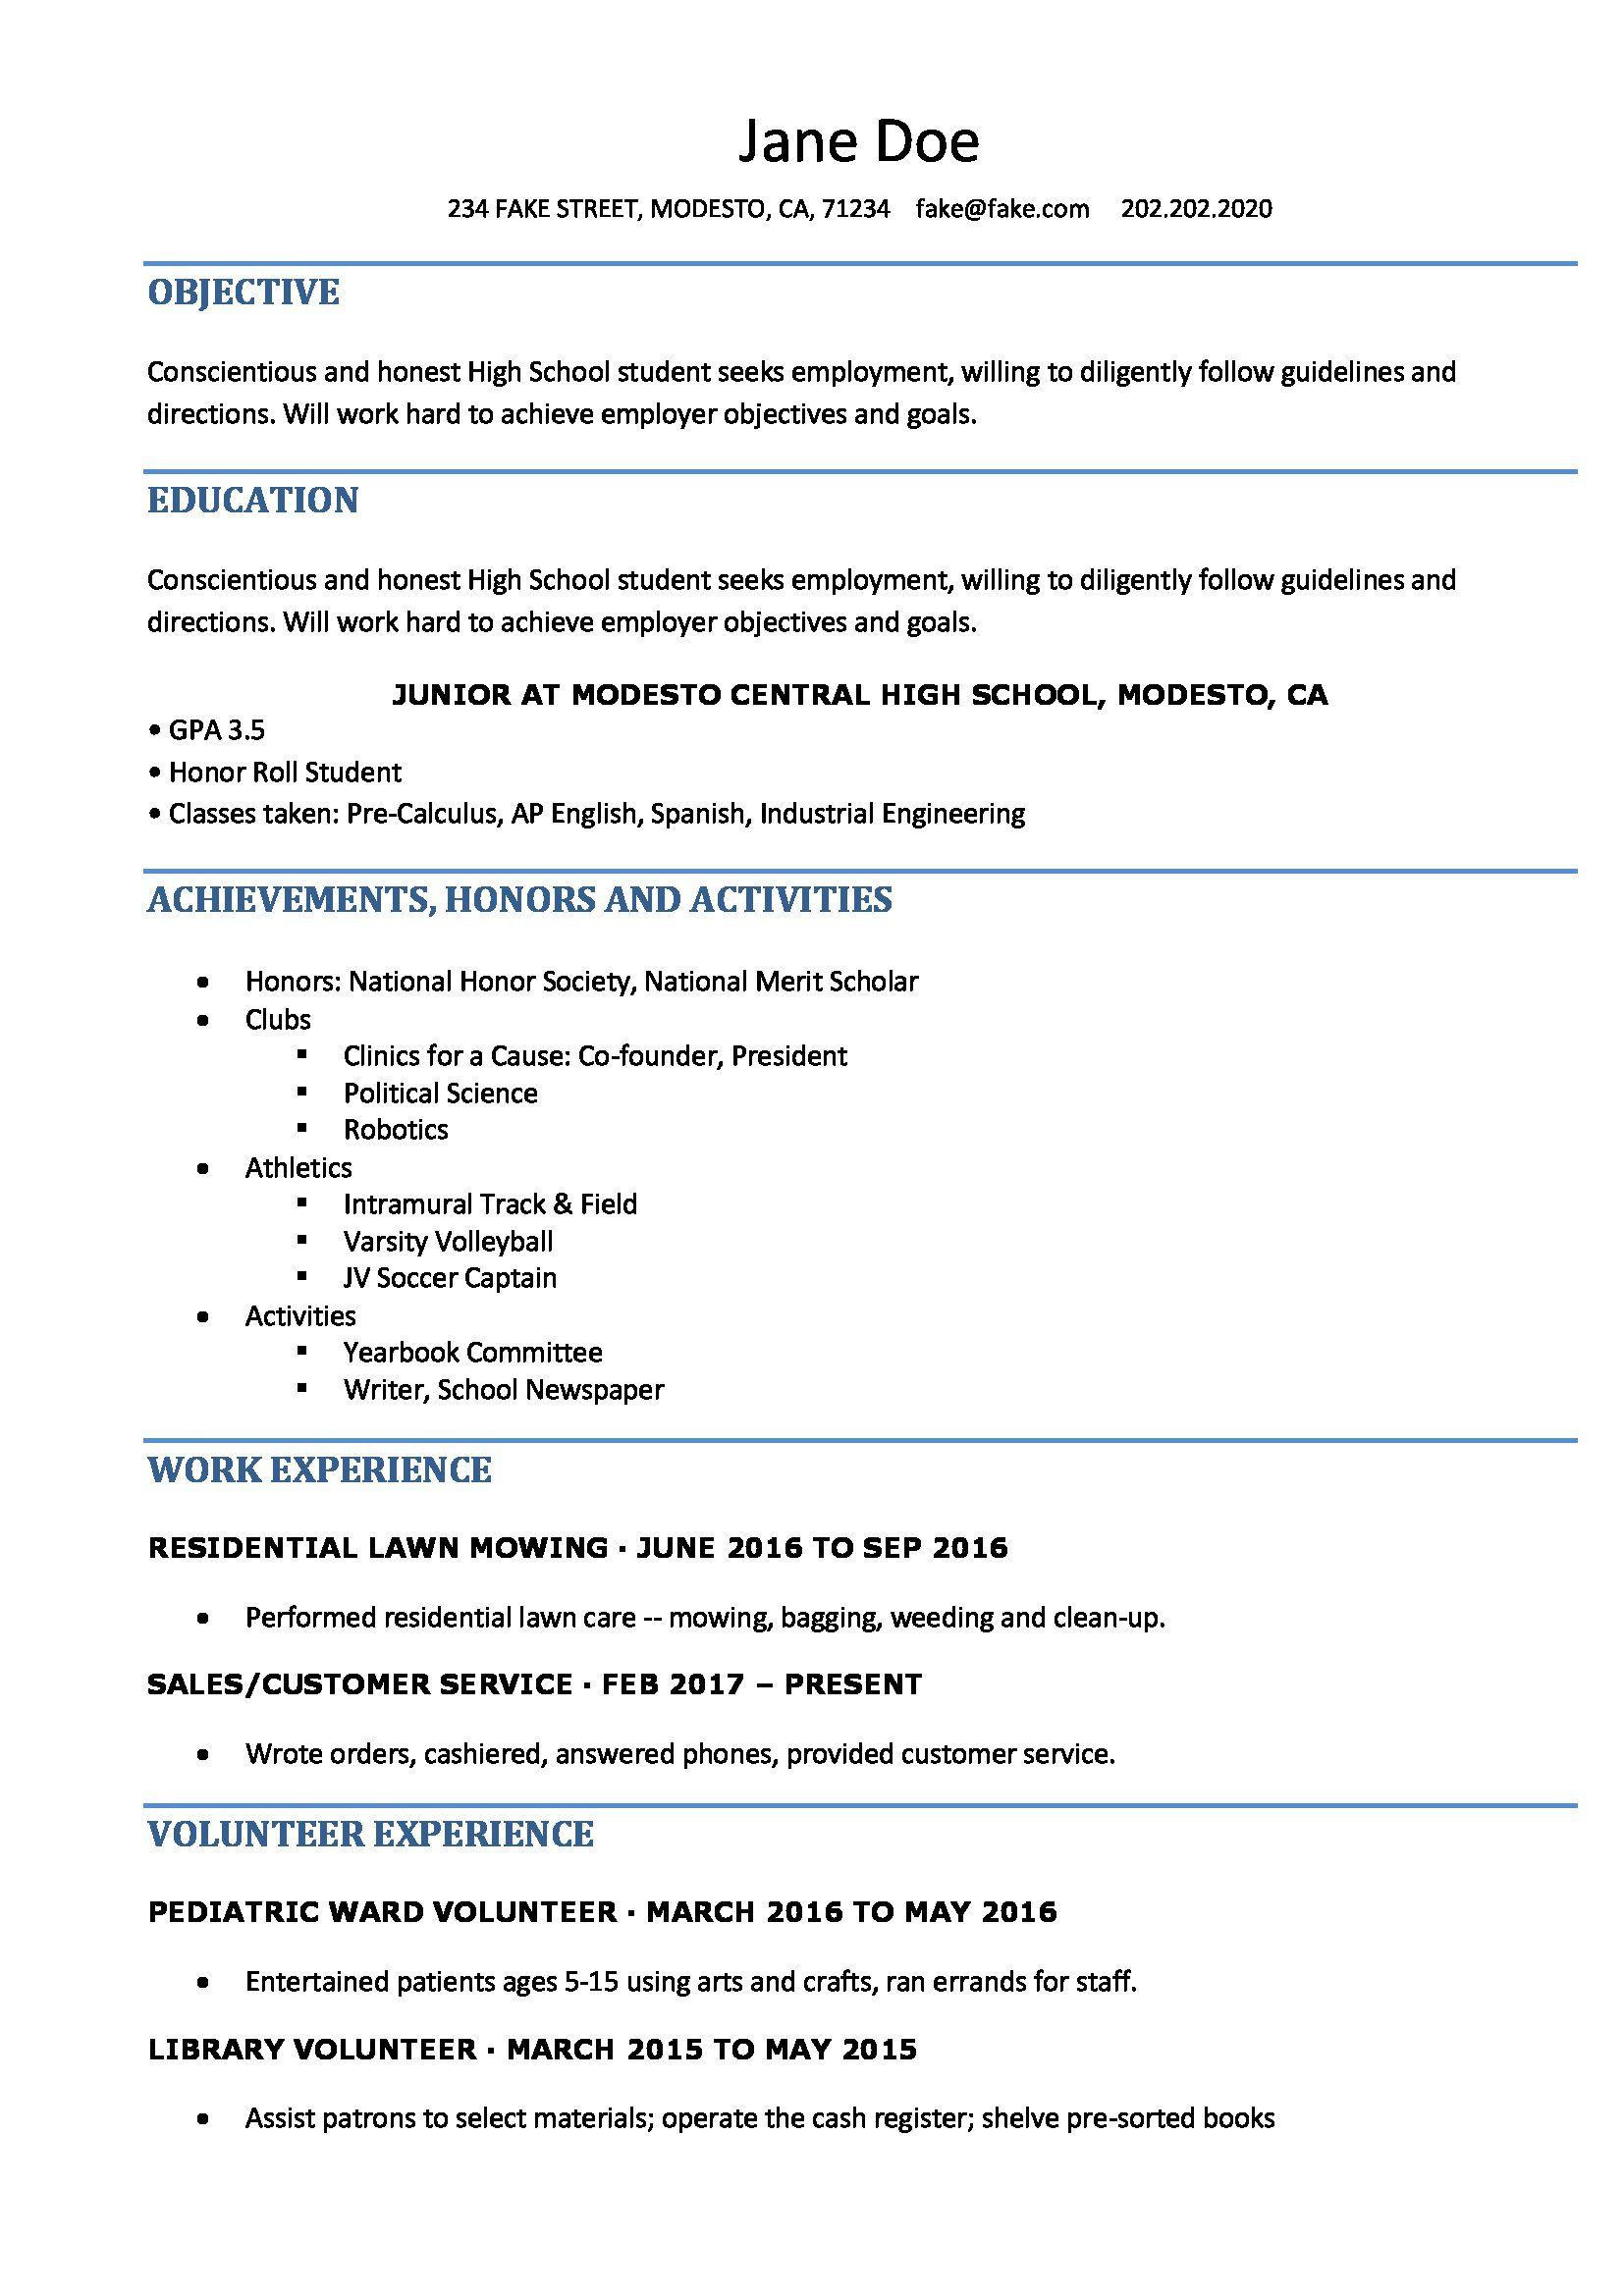 006 Singular Resume Template High School Student Idea  Students Easy For Curriculum Vitae Format Pdf Free DownloadableFull